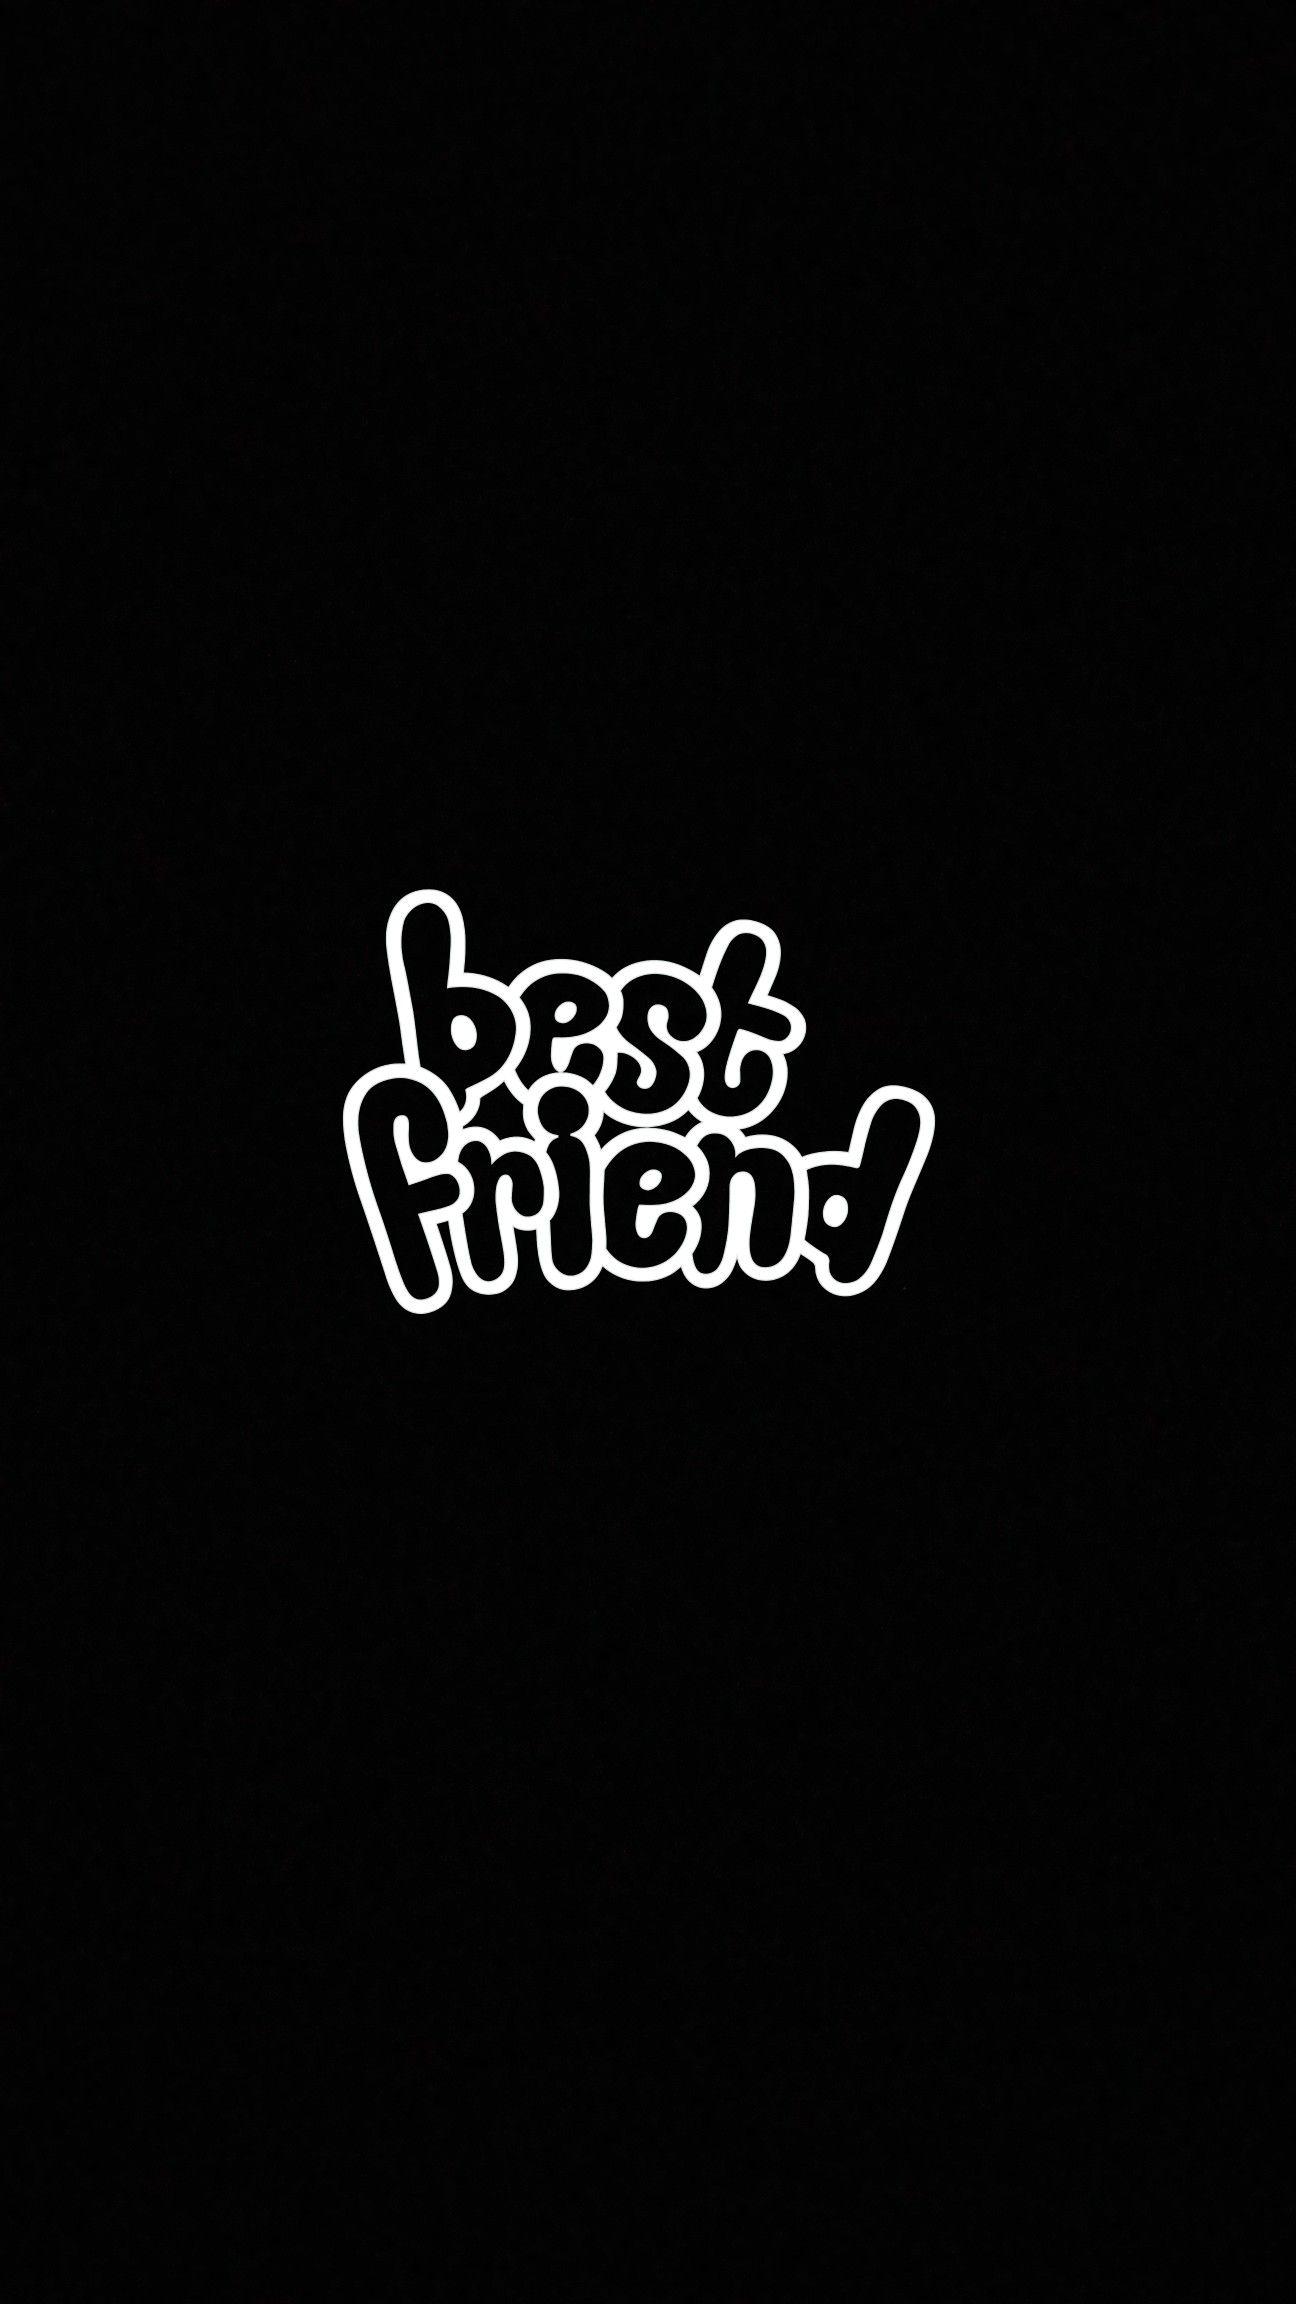 Wallpaper Best Friend Siyah Duvar Kagidi Bff Instagram